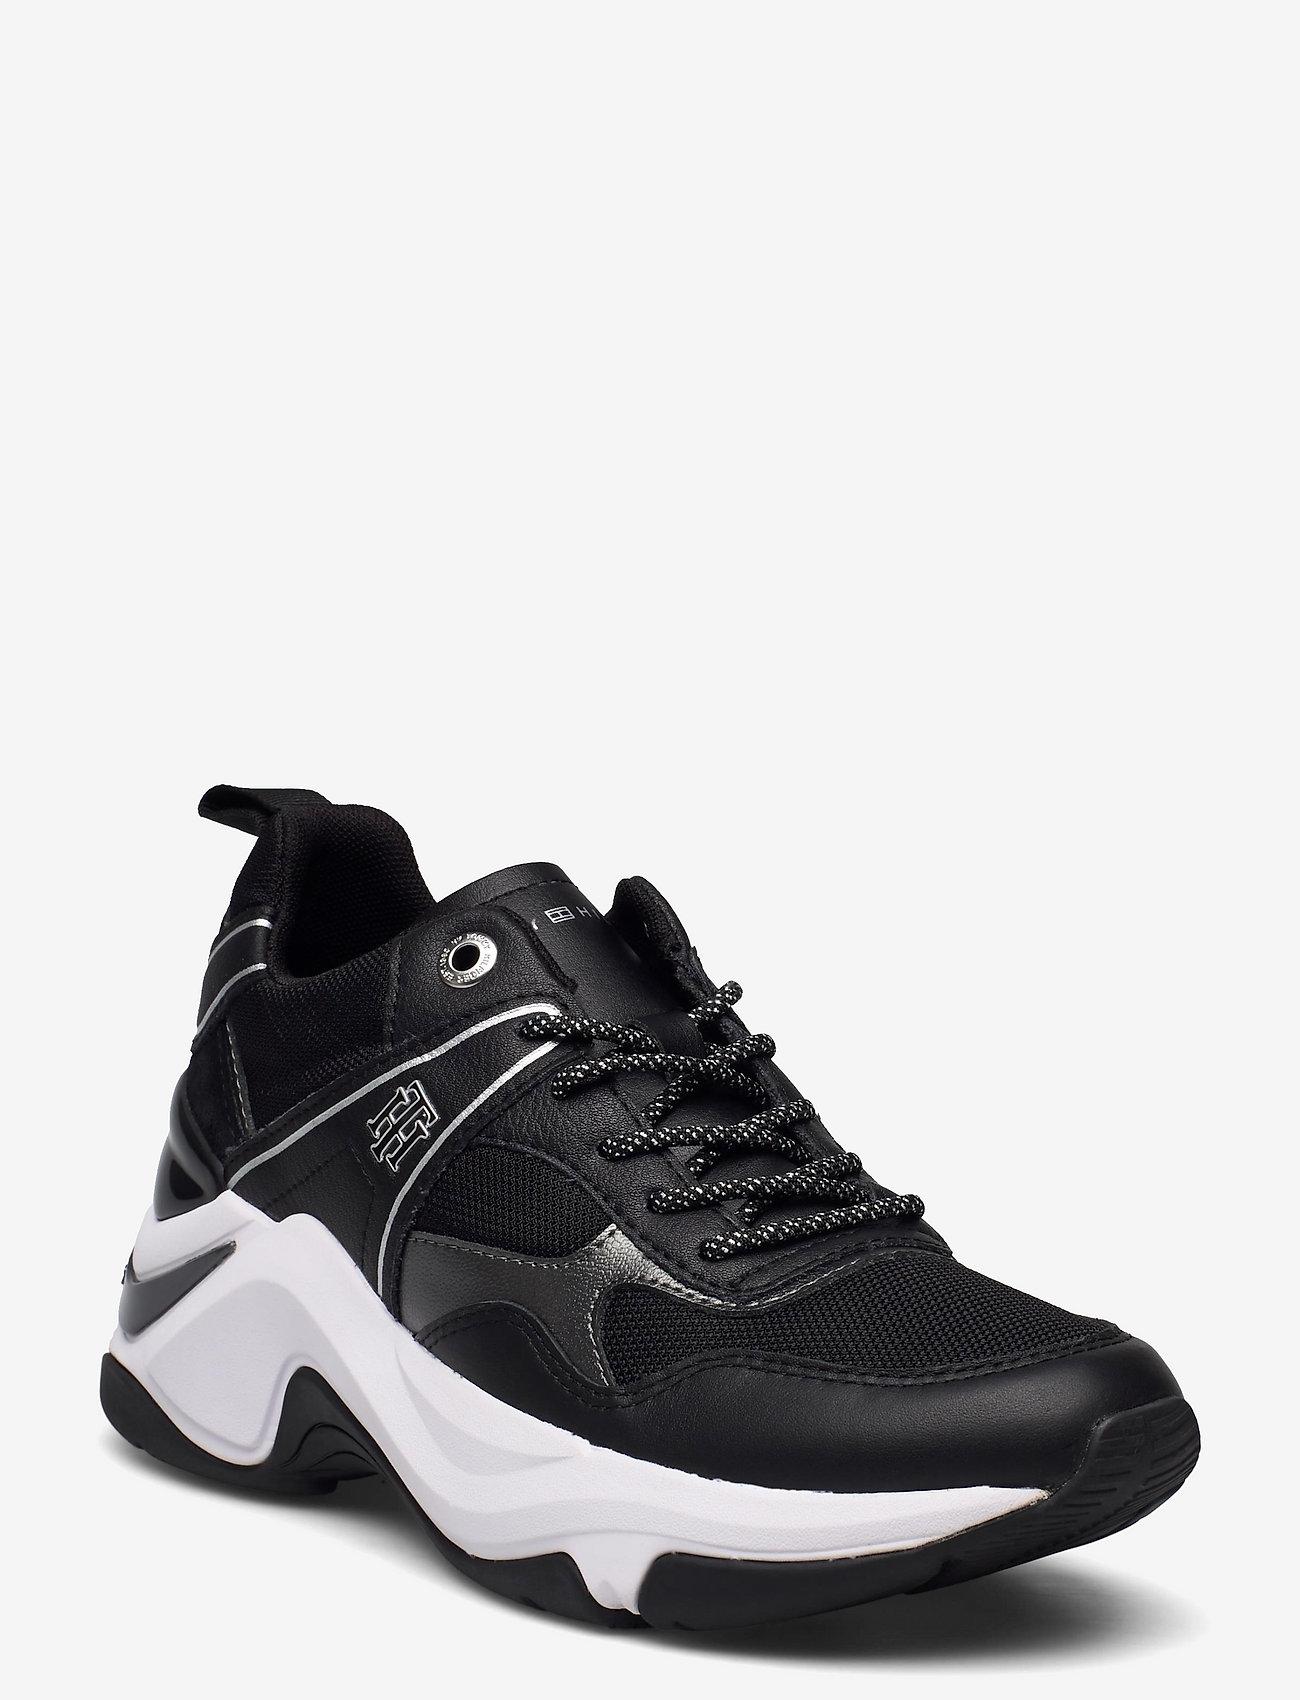 Tommy Hilfiger - FASHION WEDGE SNEAKER - low top sneakers - black - 0